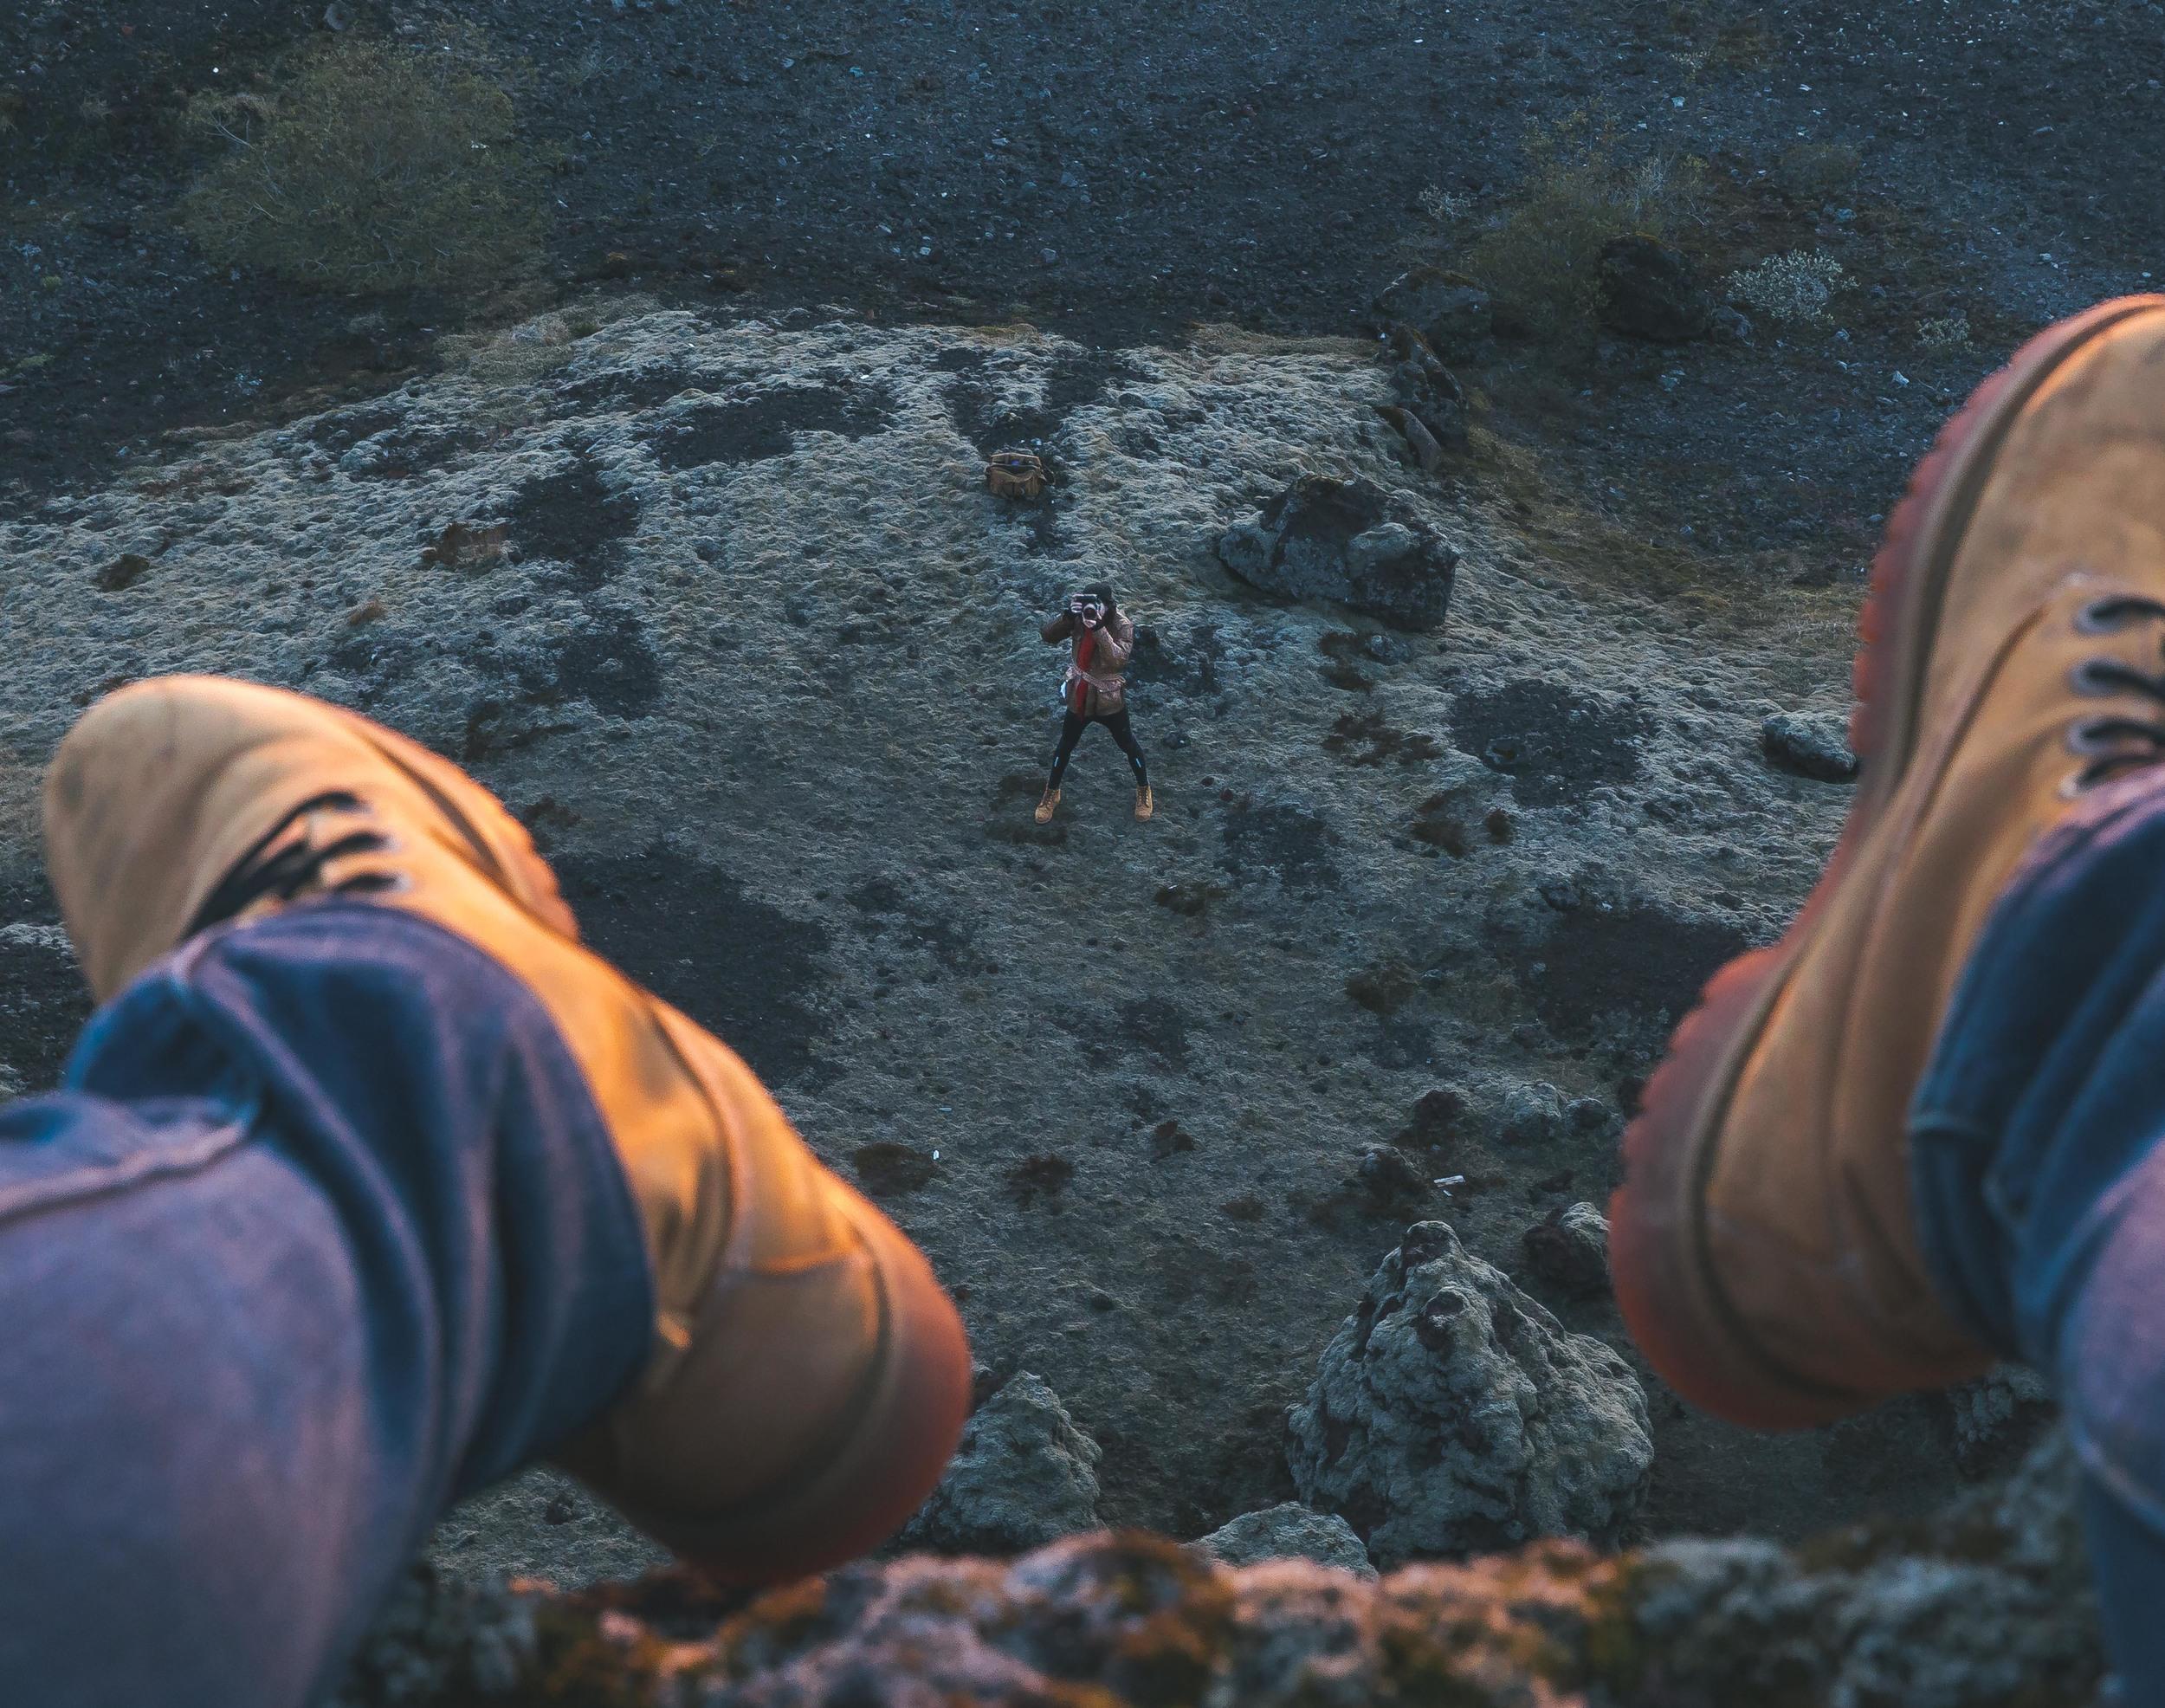 Joe Shutter Iceland Blogger Photographer Adventure-22.jpg